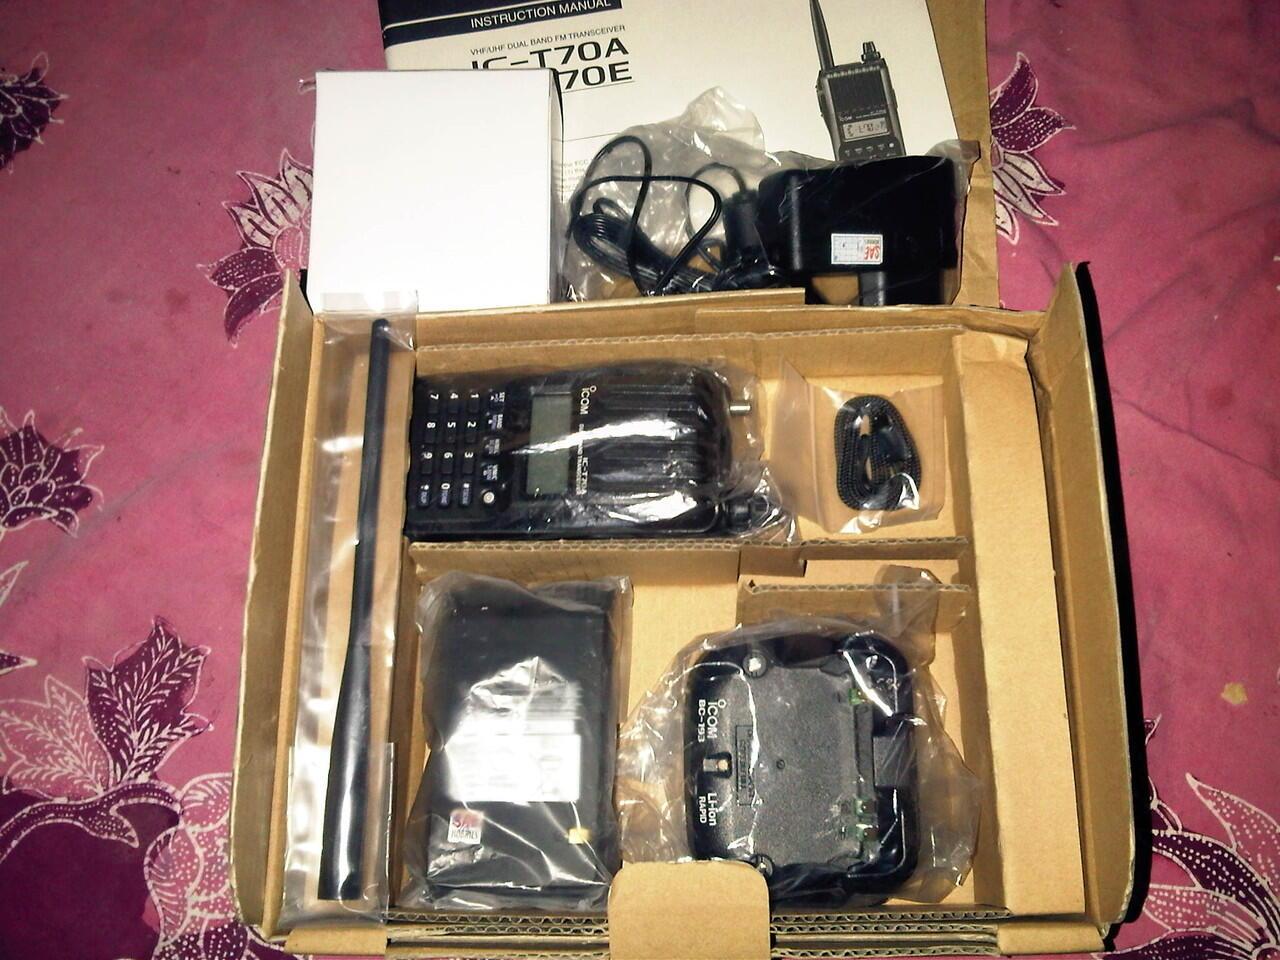 radio komunikasi HT IC T70